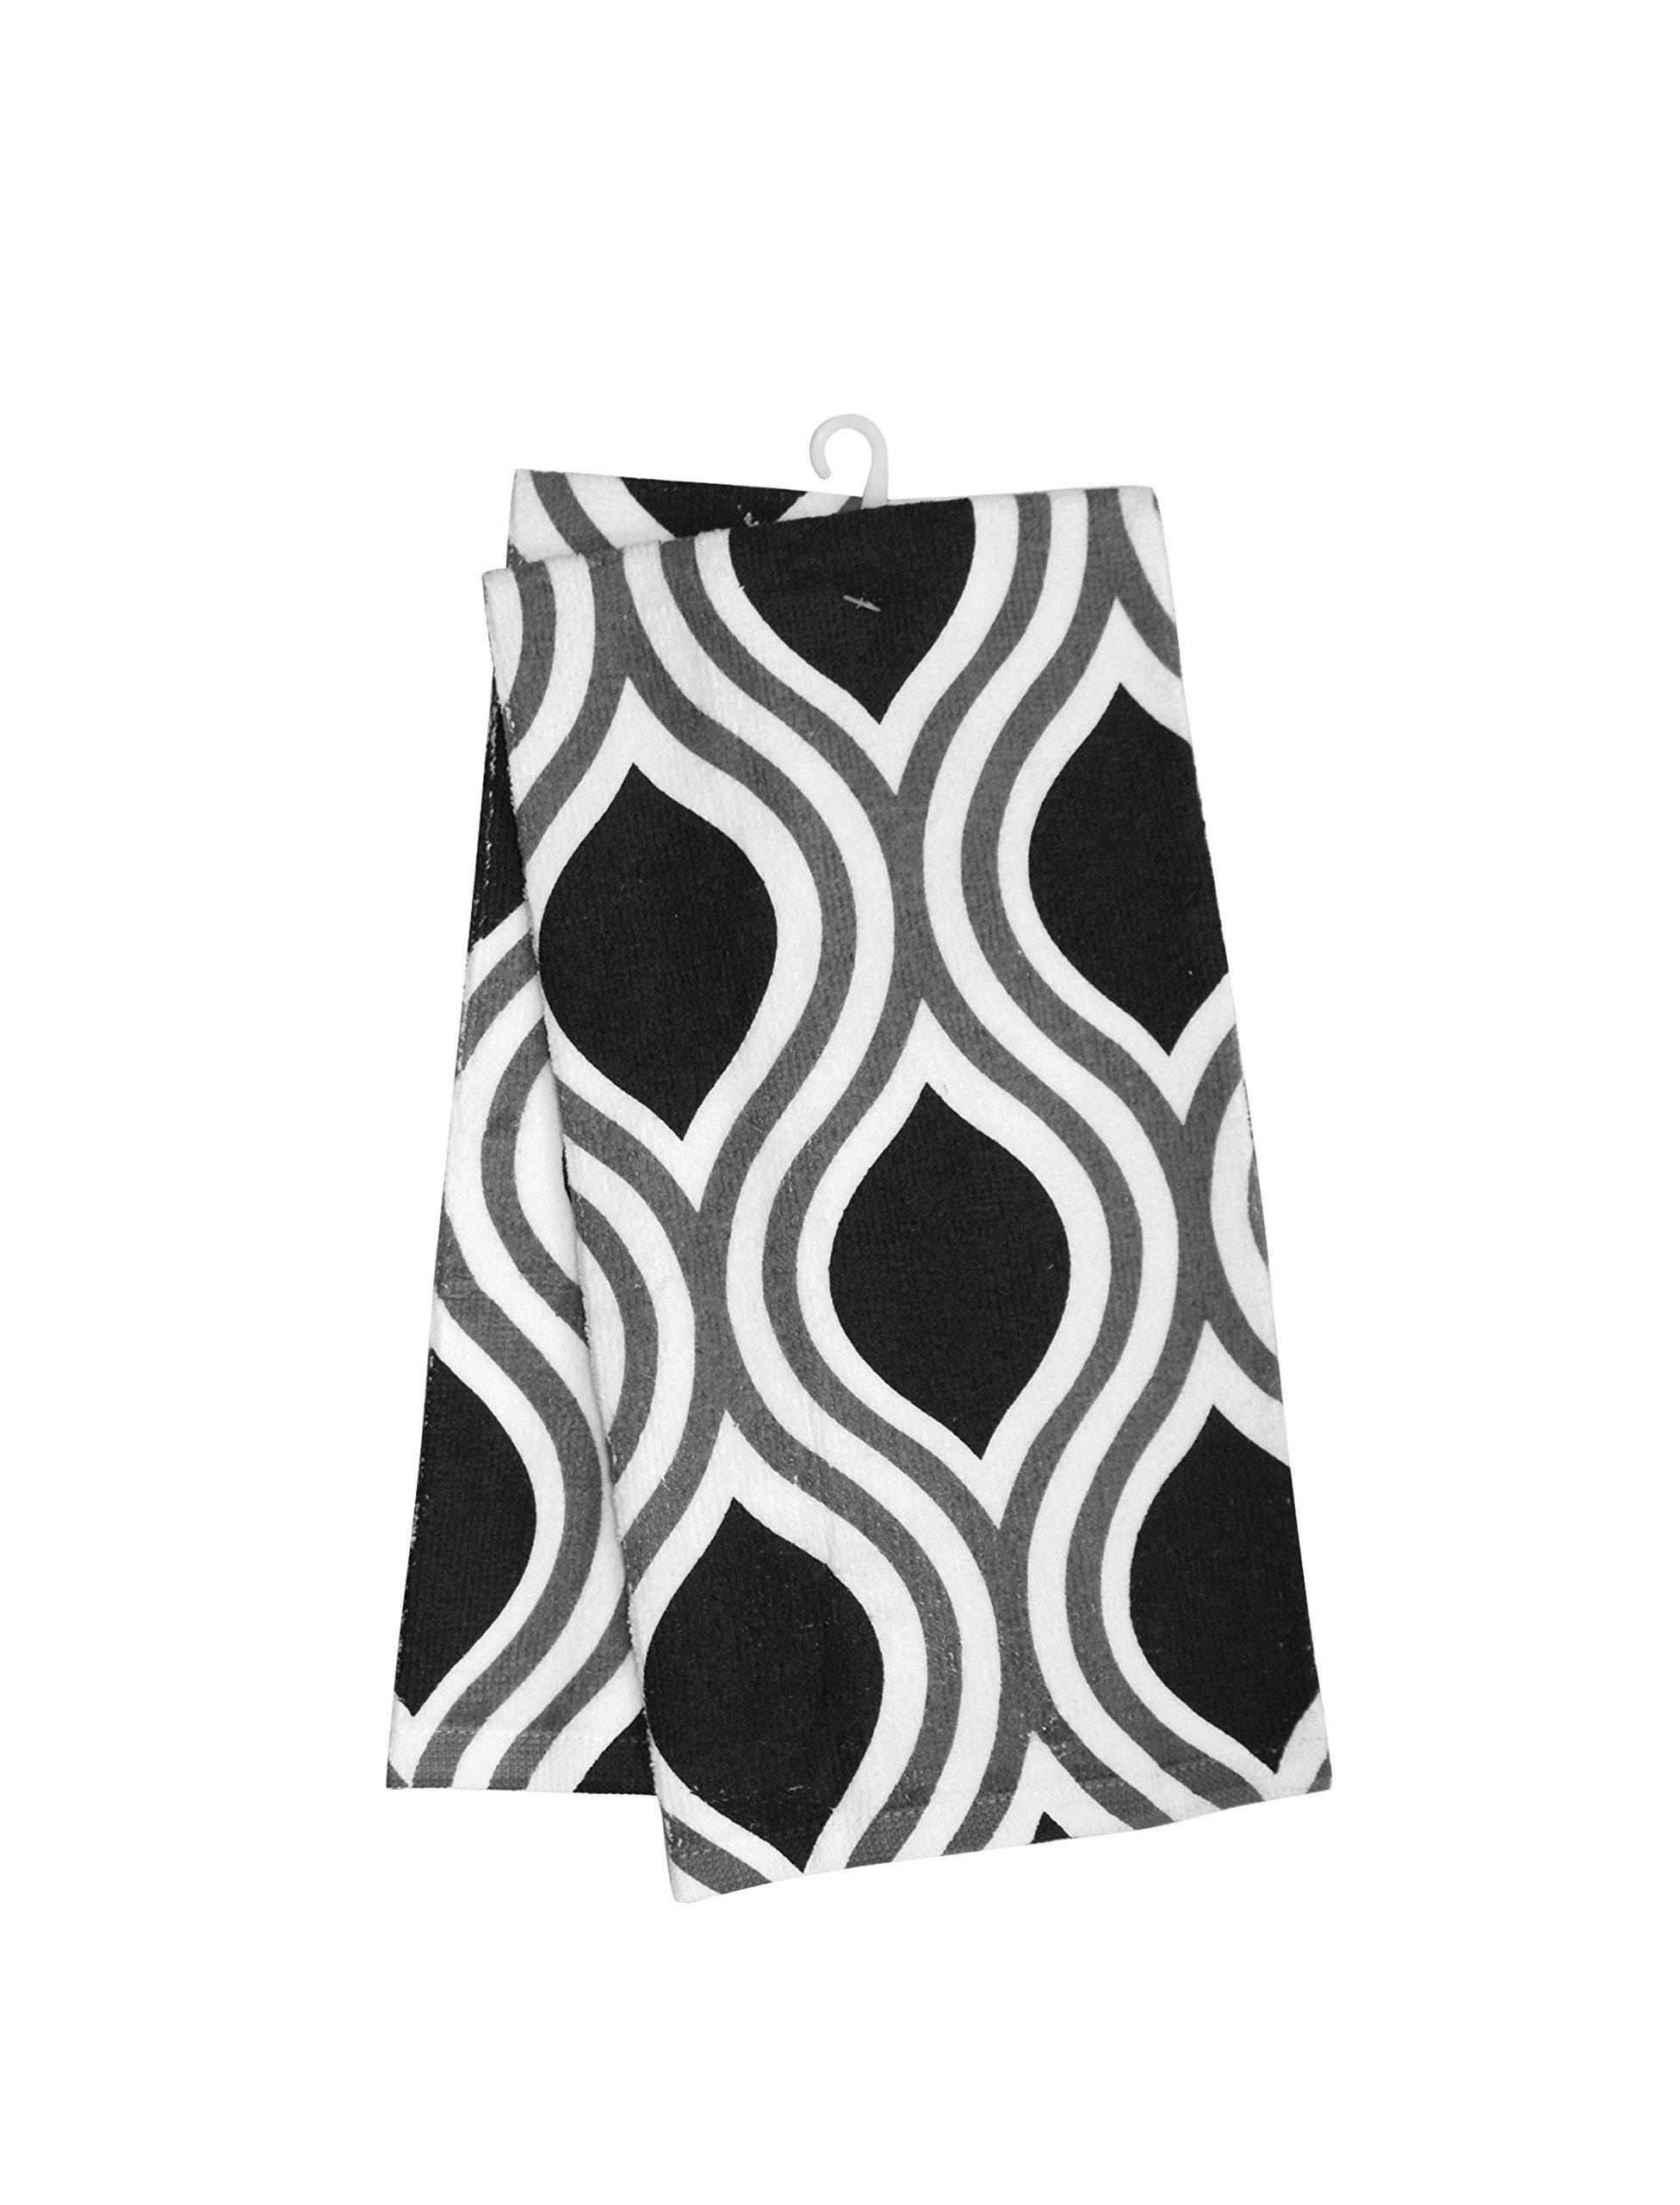 Hotel Tear Kitchen Towel (2 Pack), Black/Grey